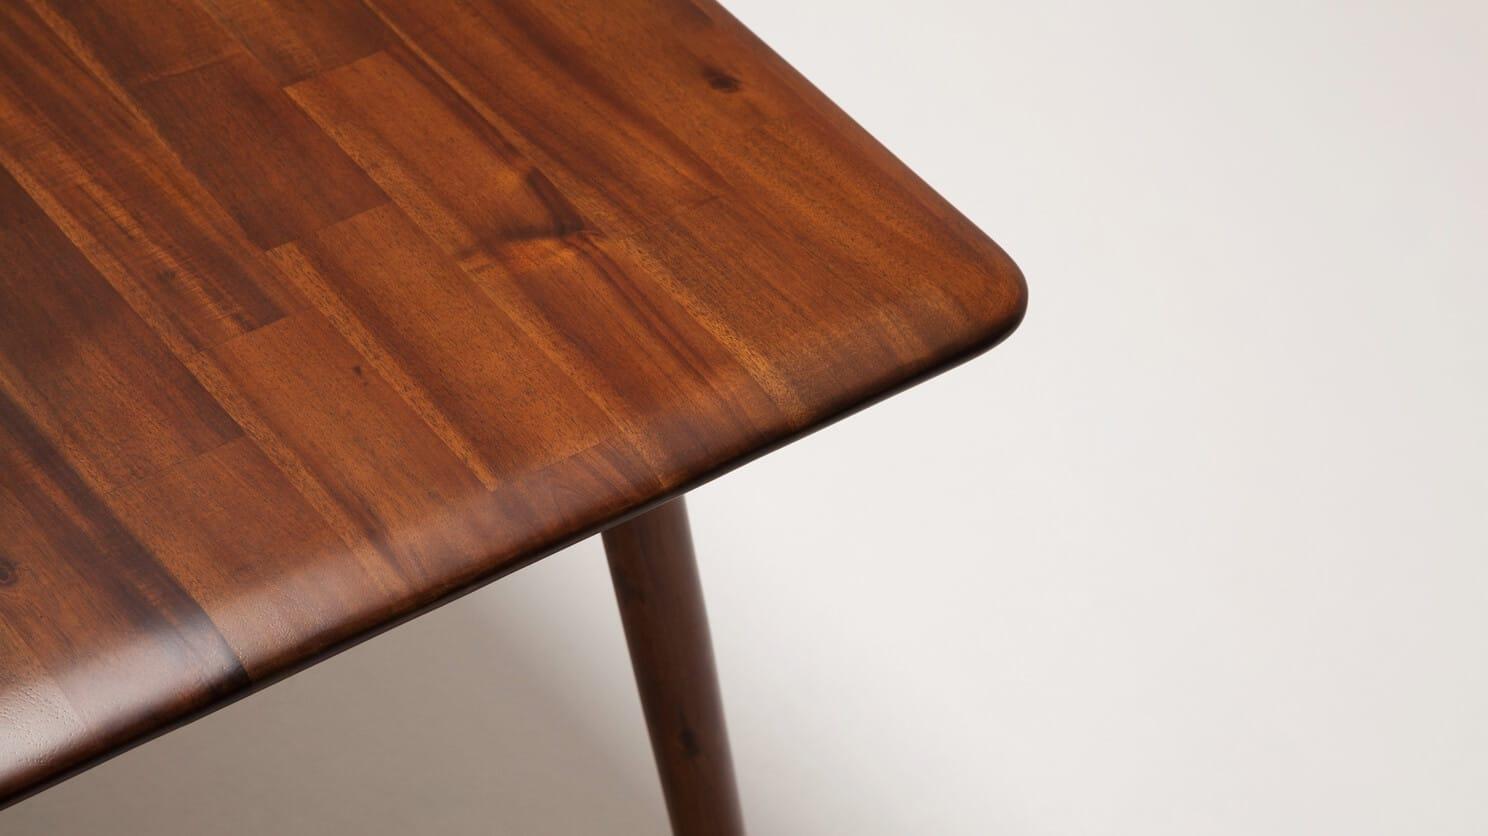 7110 300 49 5 dining tables kacia dining table detail 03